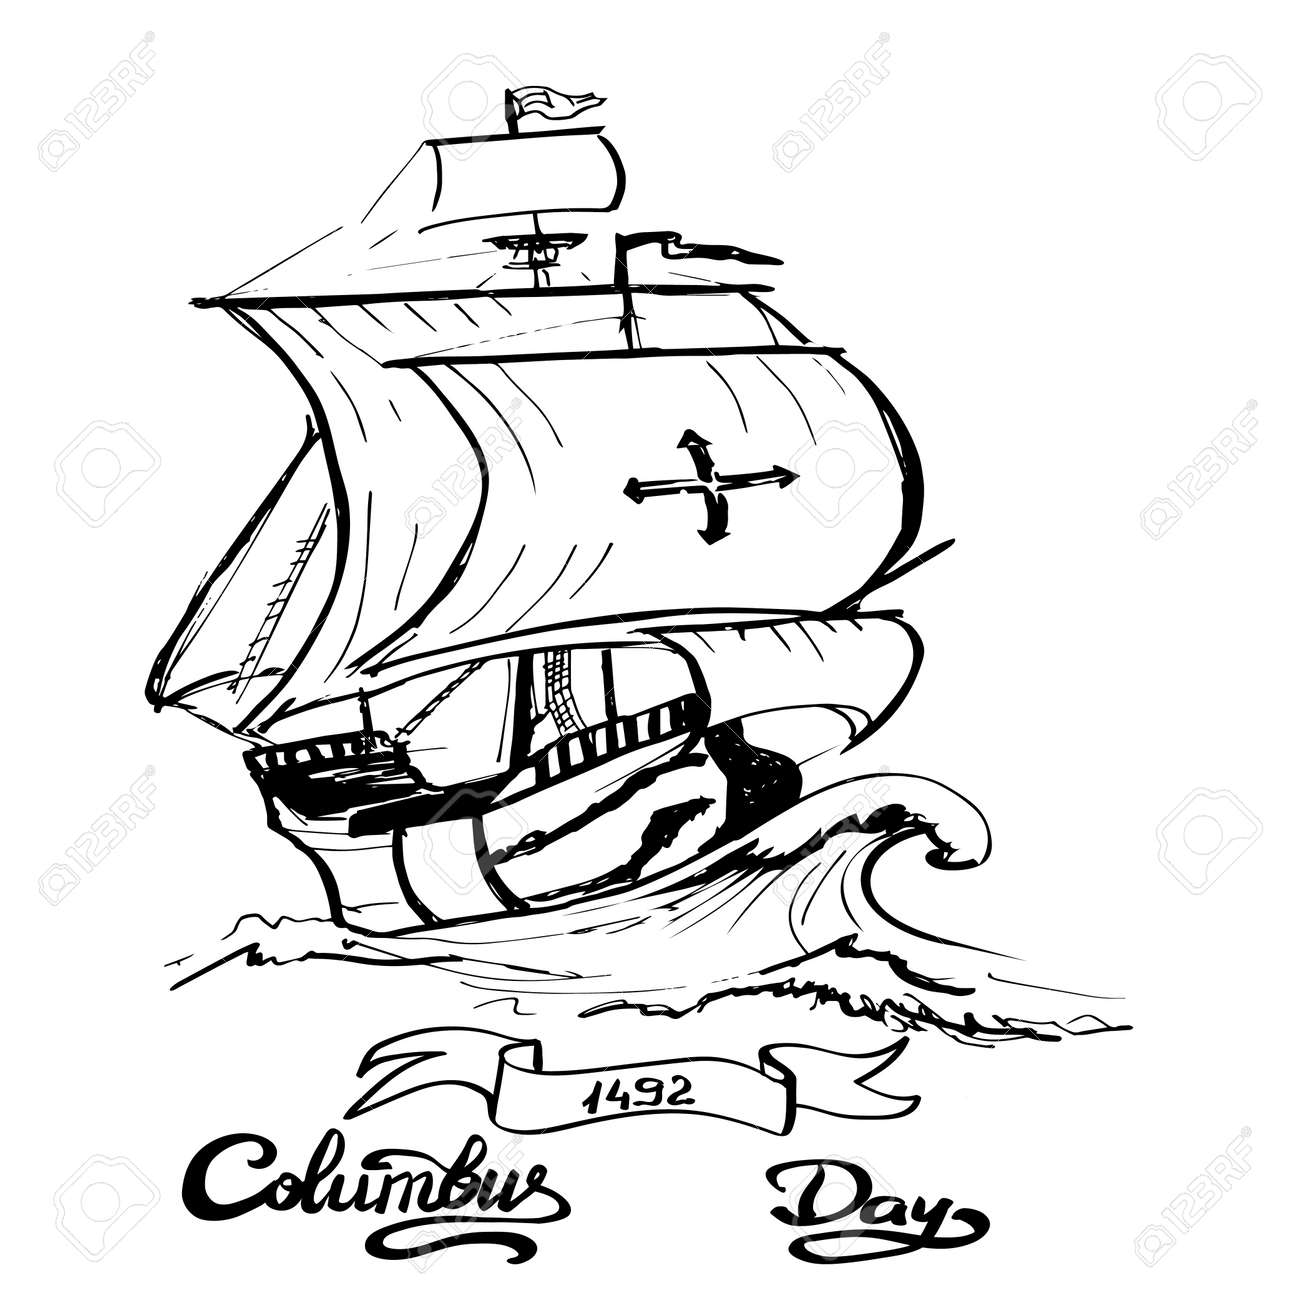 columbus day sign santa maria boat vector illustration royalty rh 123rf com